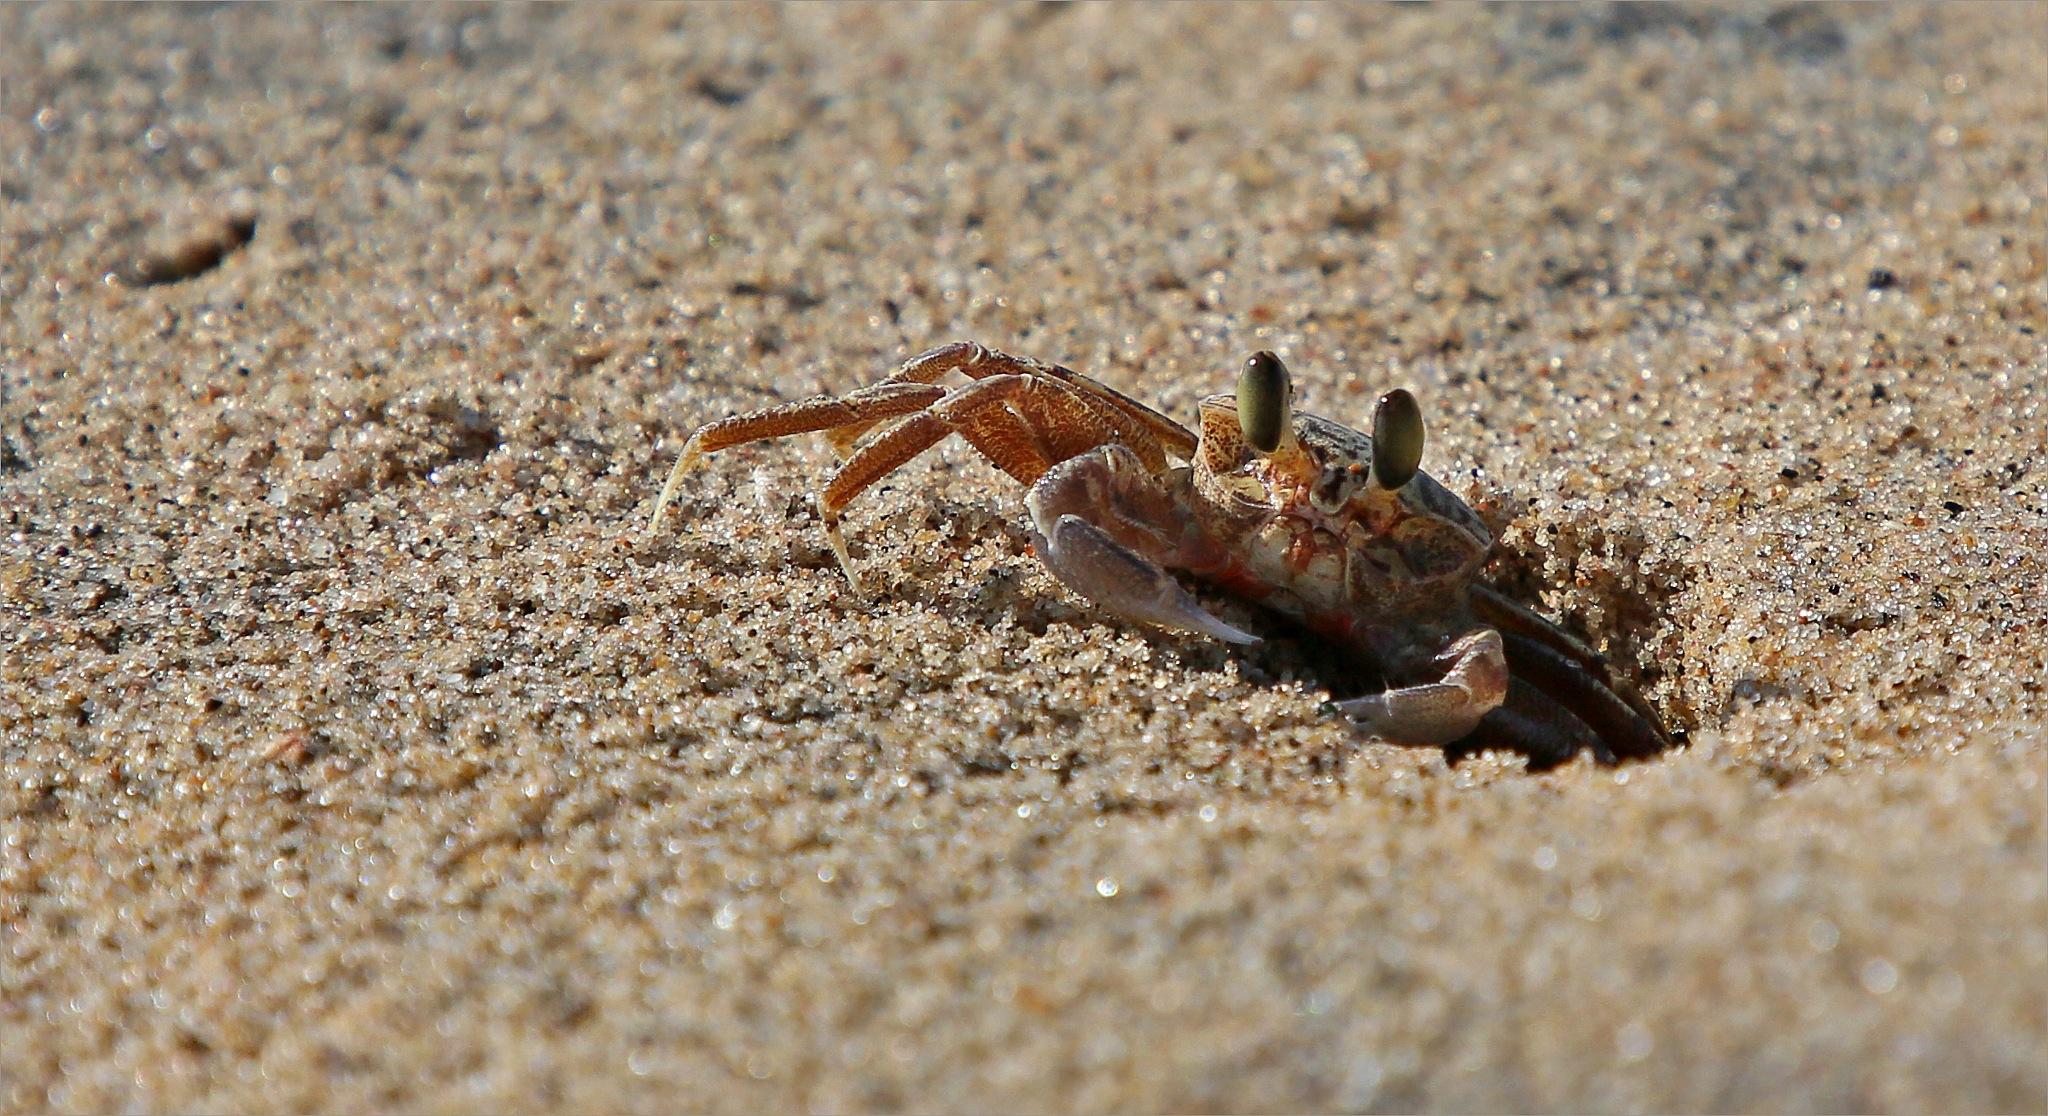 Little crab by Johann Harmse